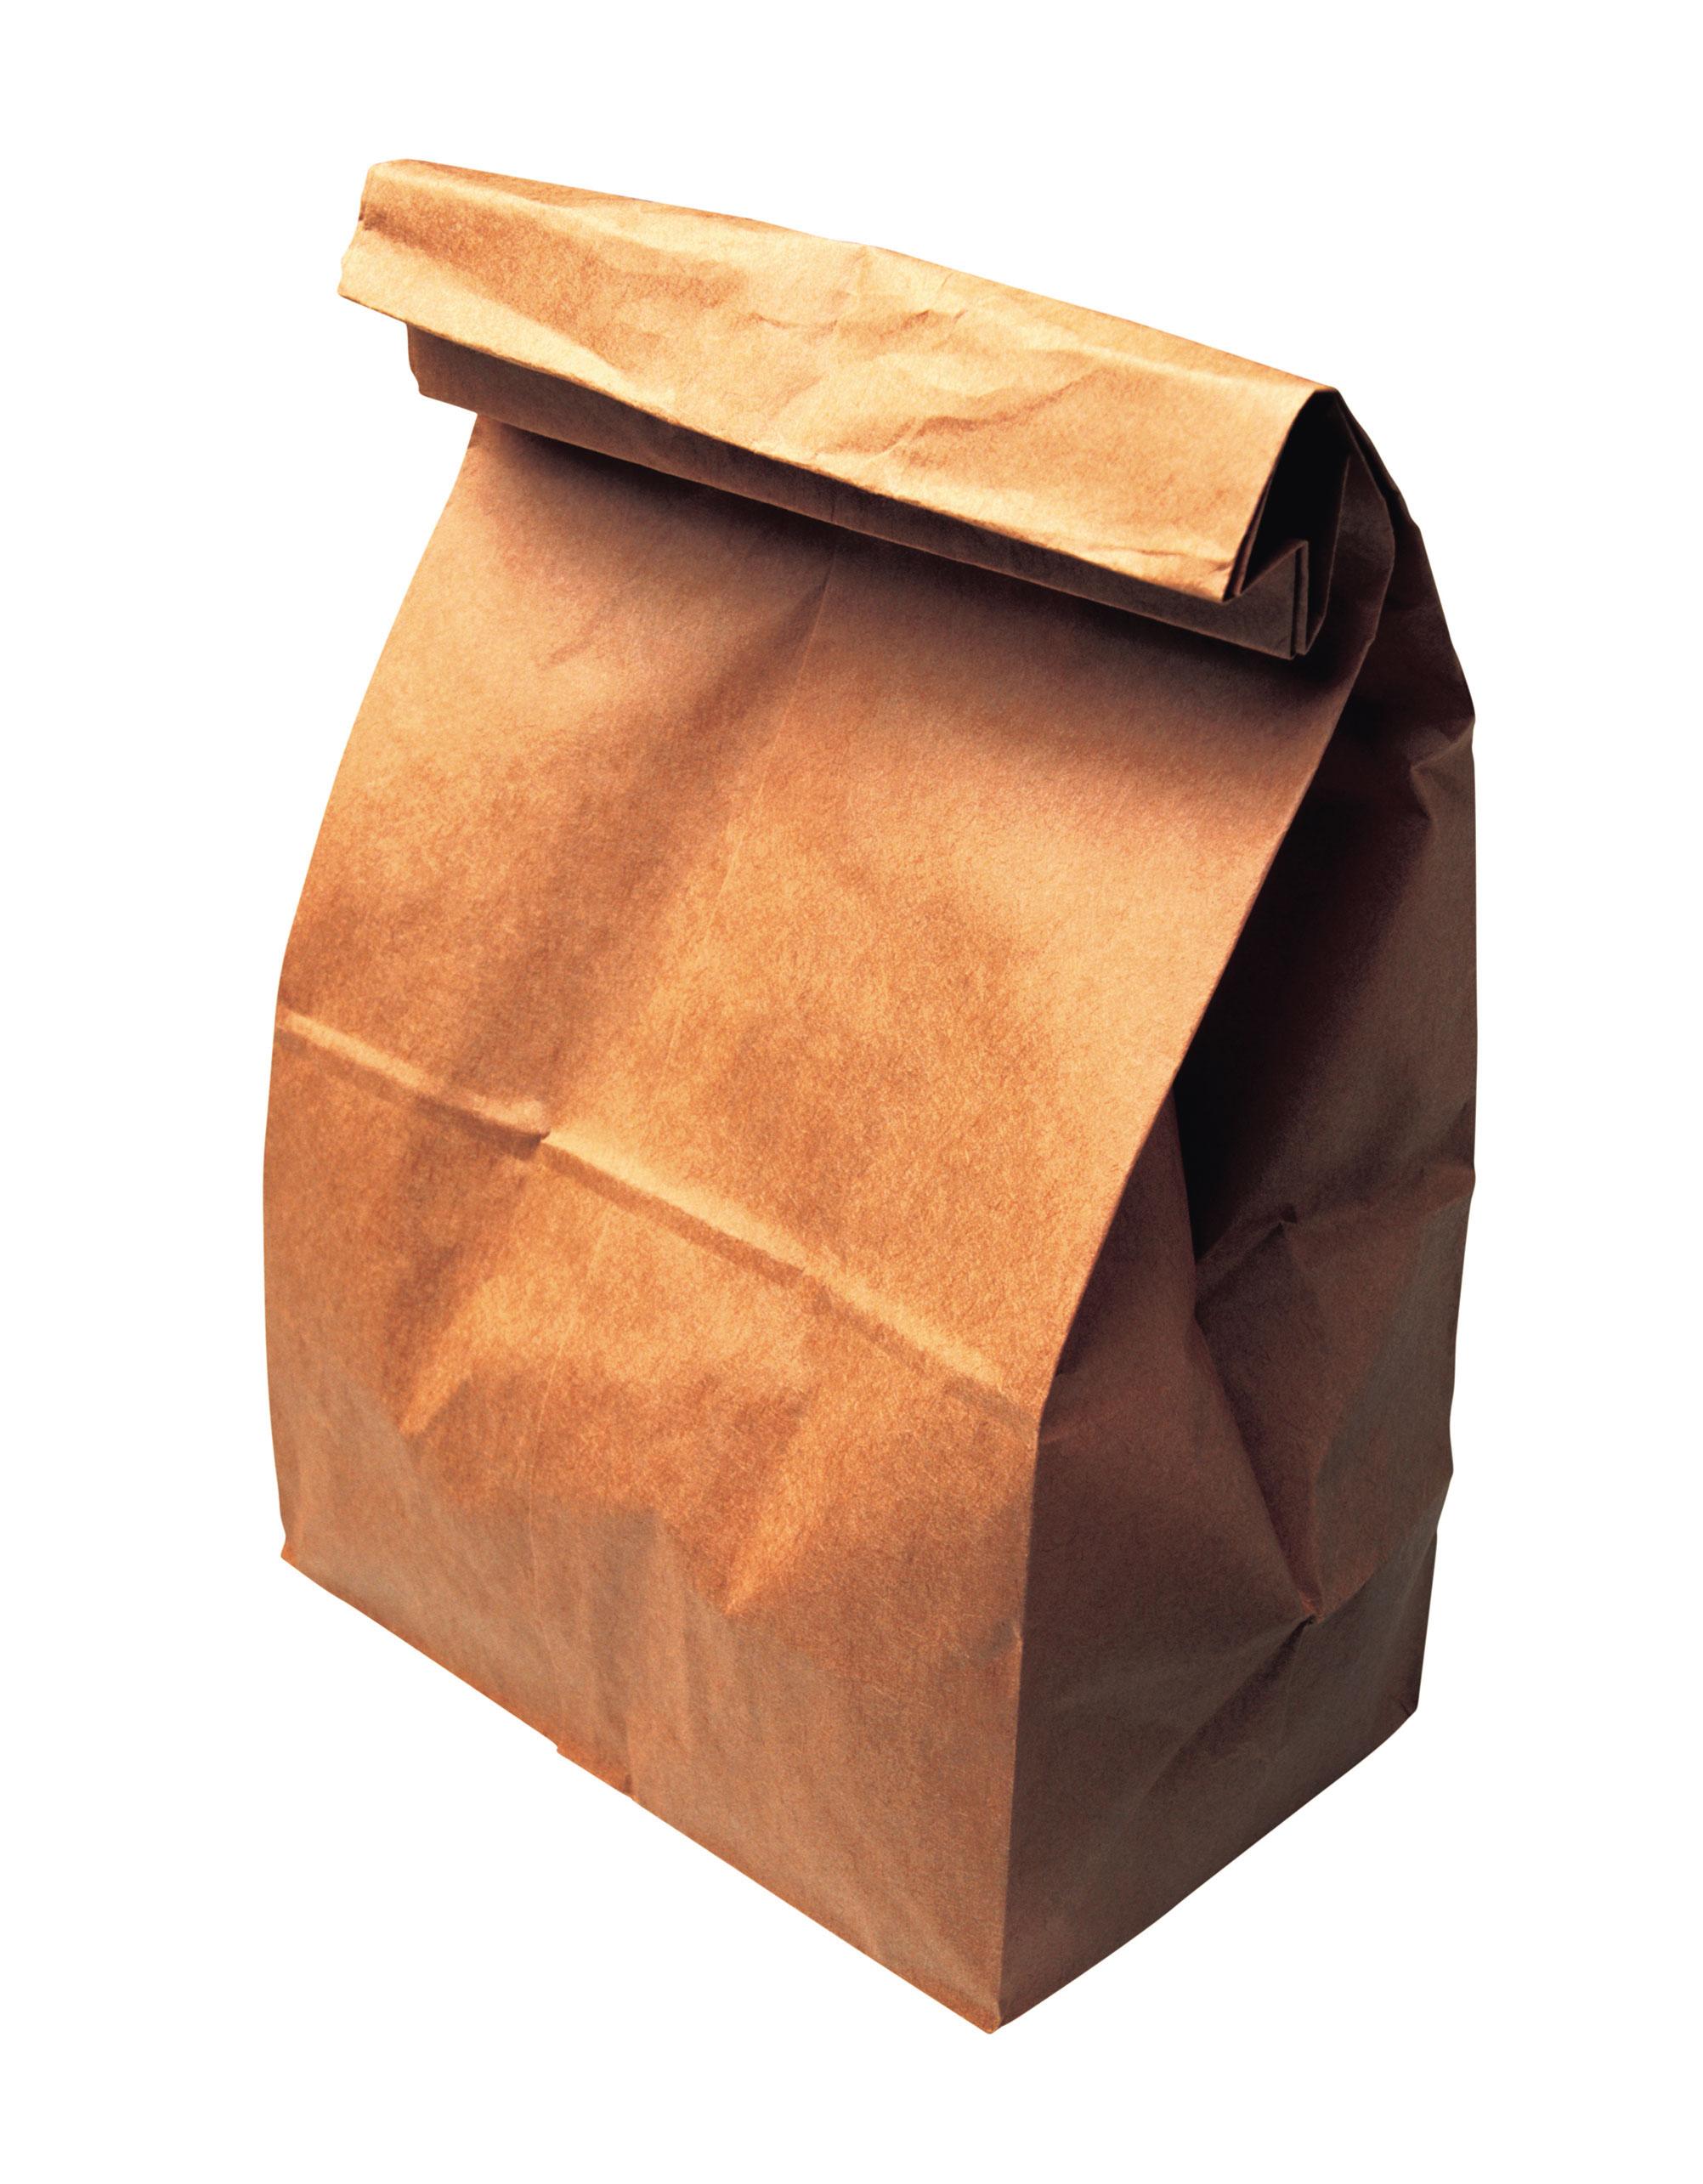 Clip Art Paper Bag Clipart brown bag clipart kid bts lunch free images at clker com vector clip art online